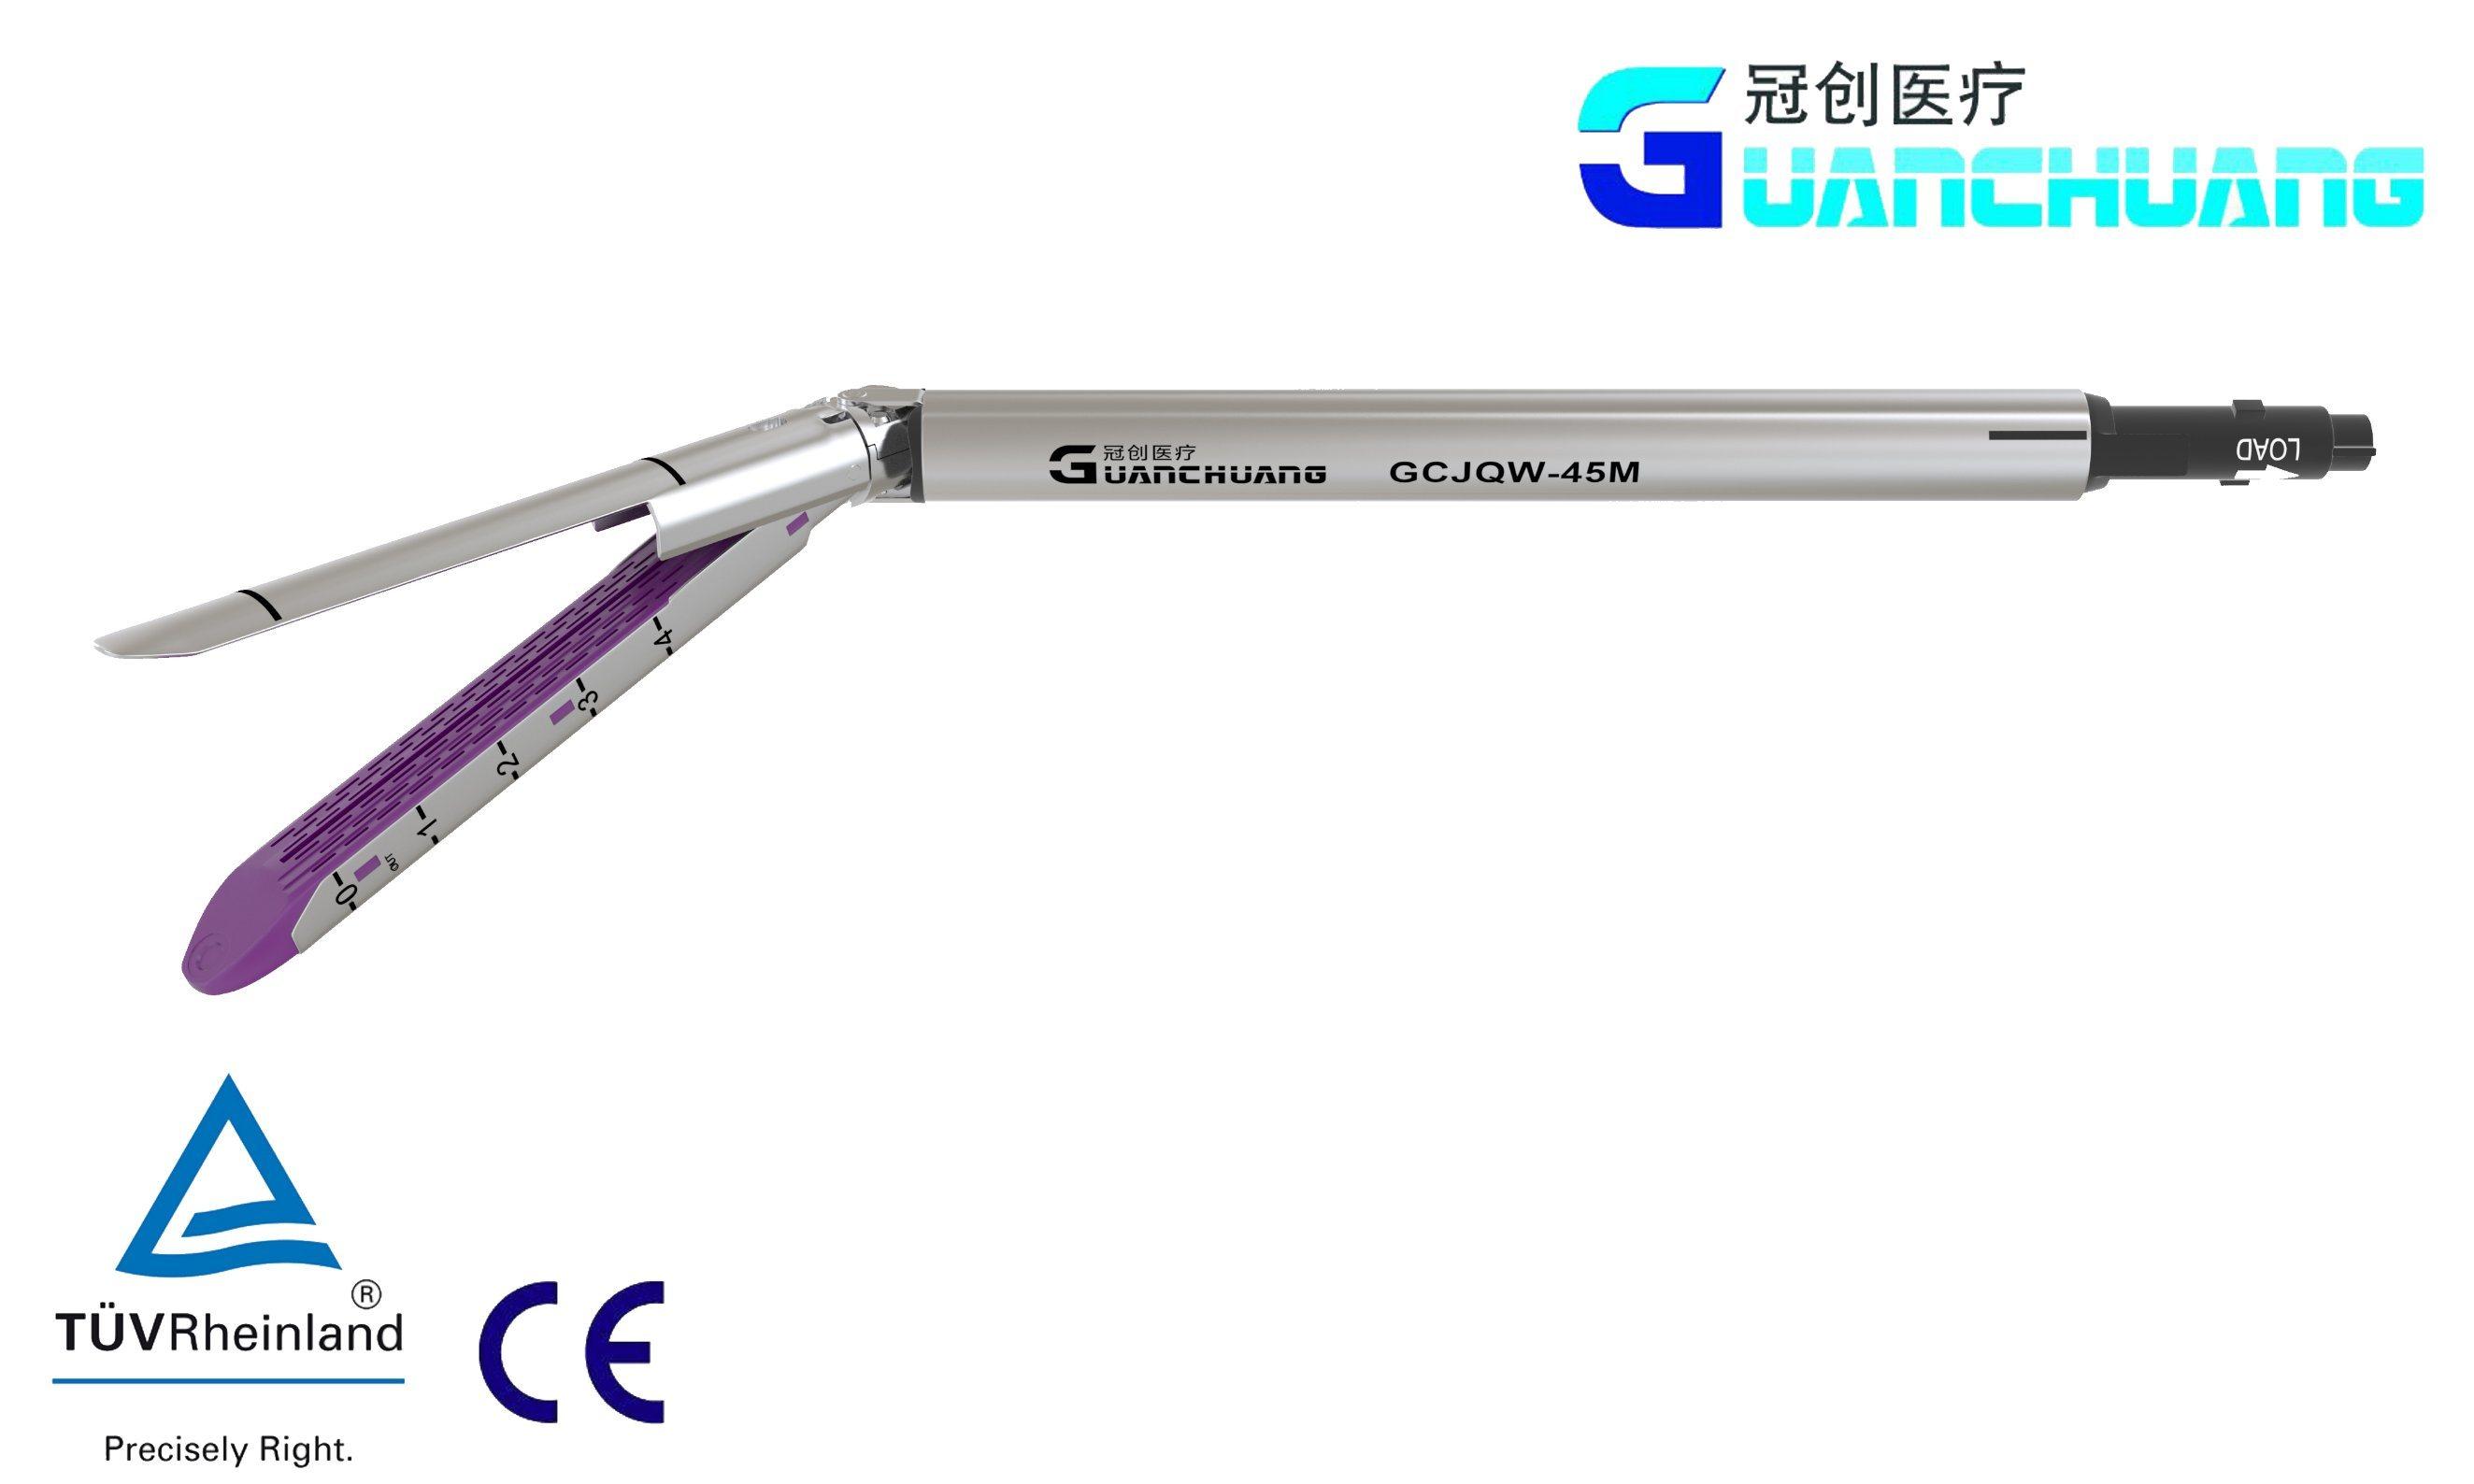 Disposable Cartridge for Endoscopic Cutter Stapler